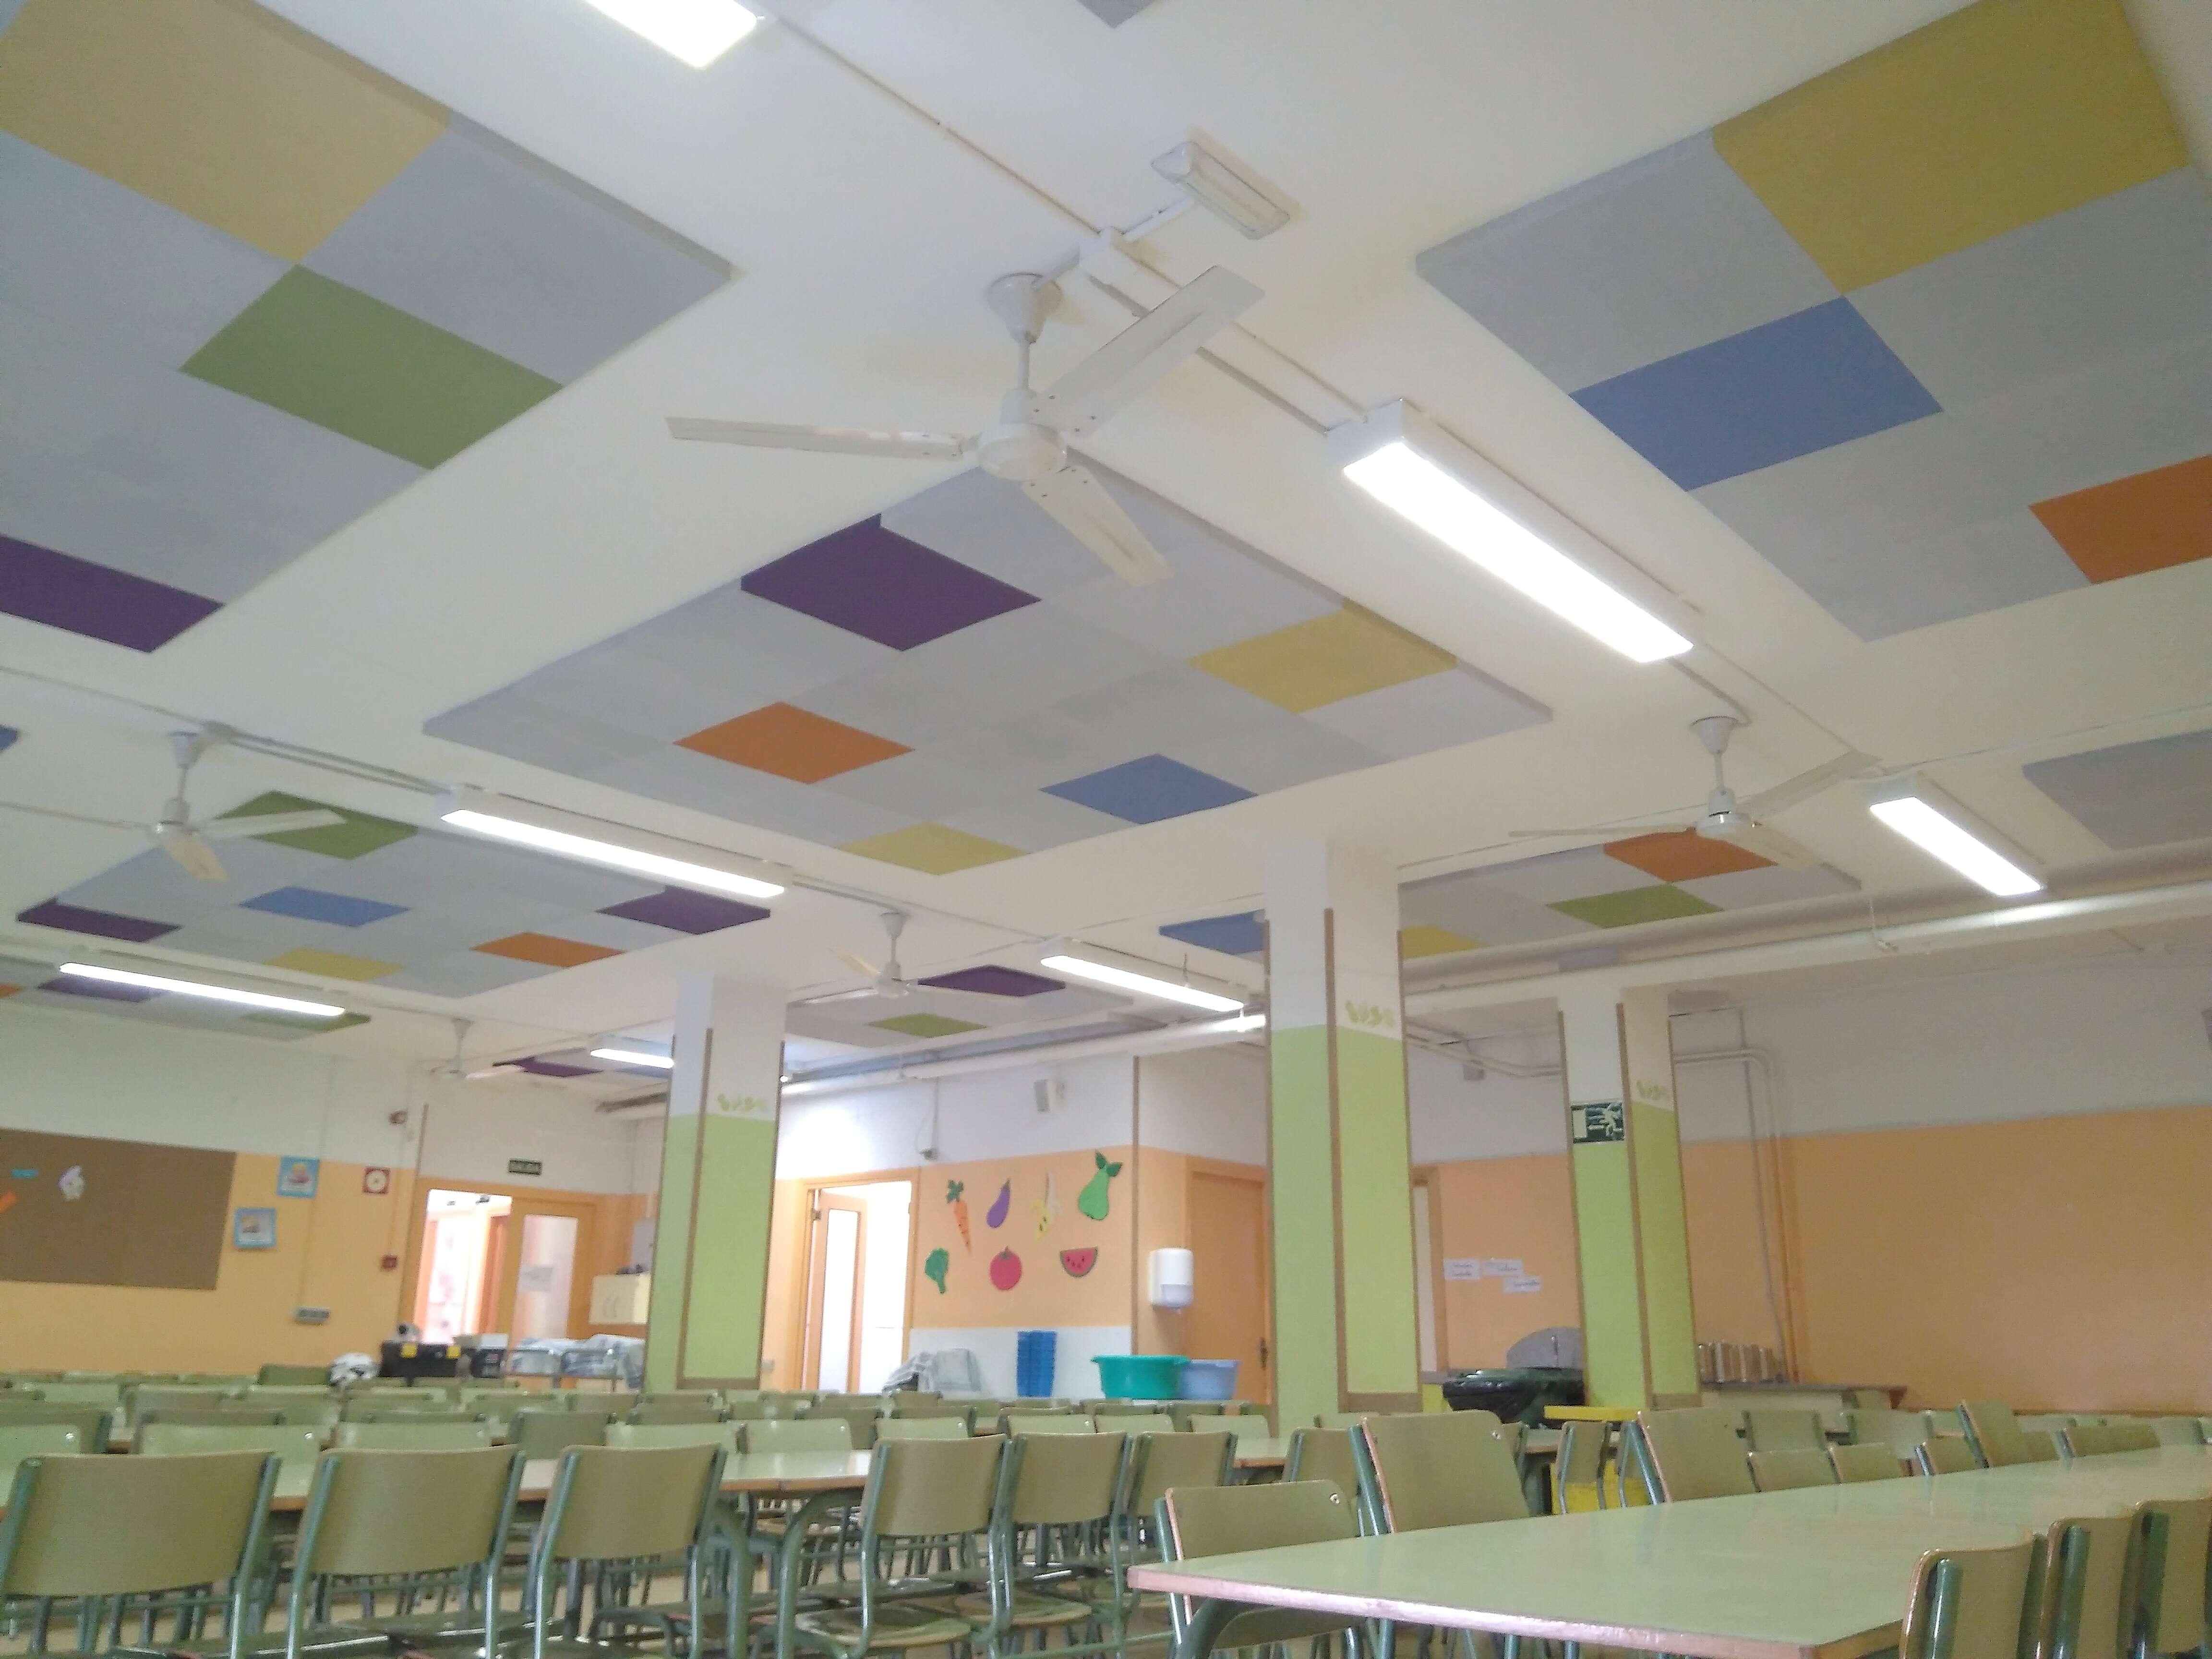 Comedor escolar con combinación de colores de paneles absorbentes